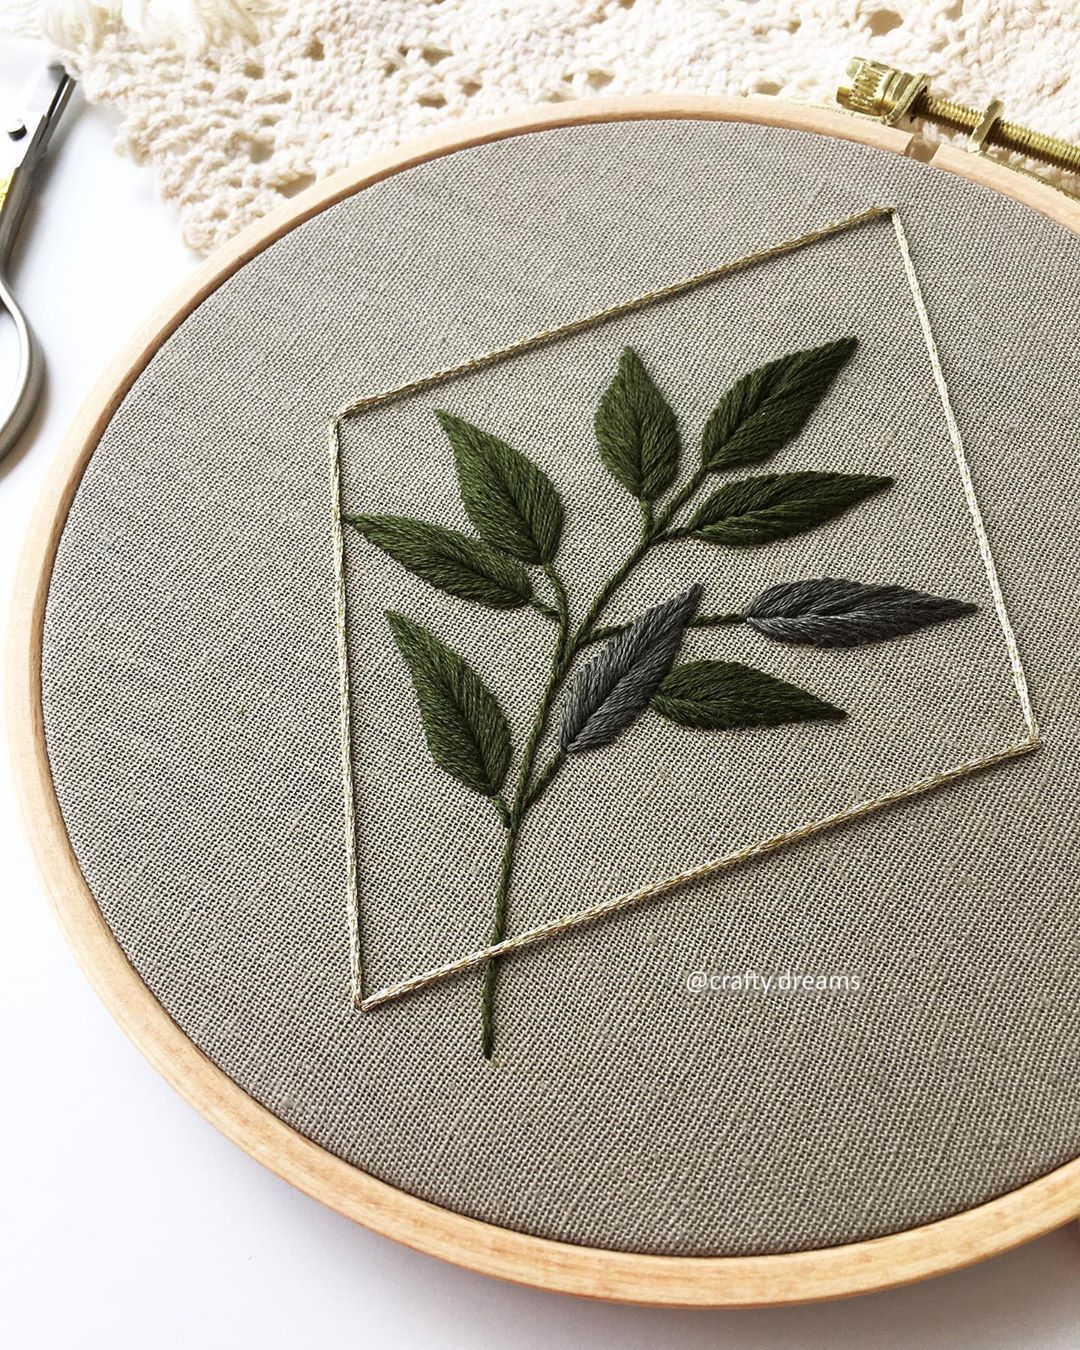 "Ashrifa Anwer sur Instagram: «Joyeux mercredi à tous! . . #craftydreams #embroidery #ashrifaanwer #fiberartist #hoopembroidery #etsy #etsyuk #etsyseller # dmcthreads… ""   – DIY"